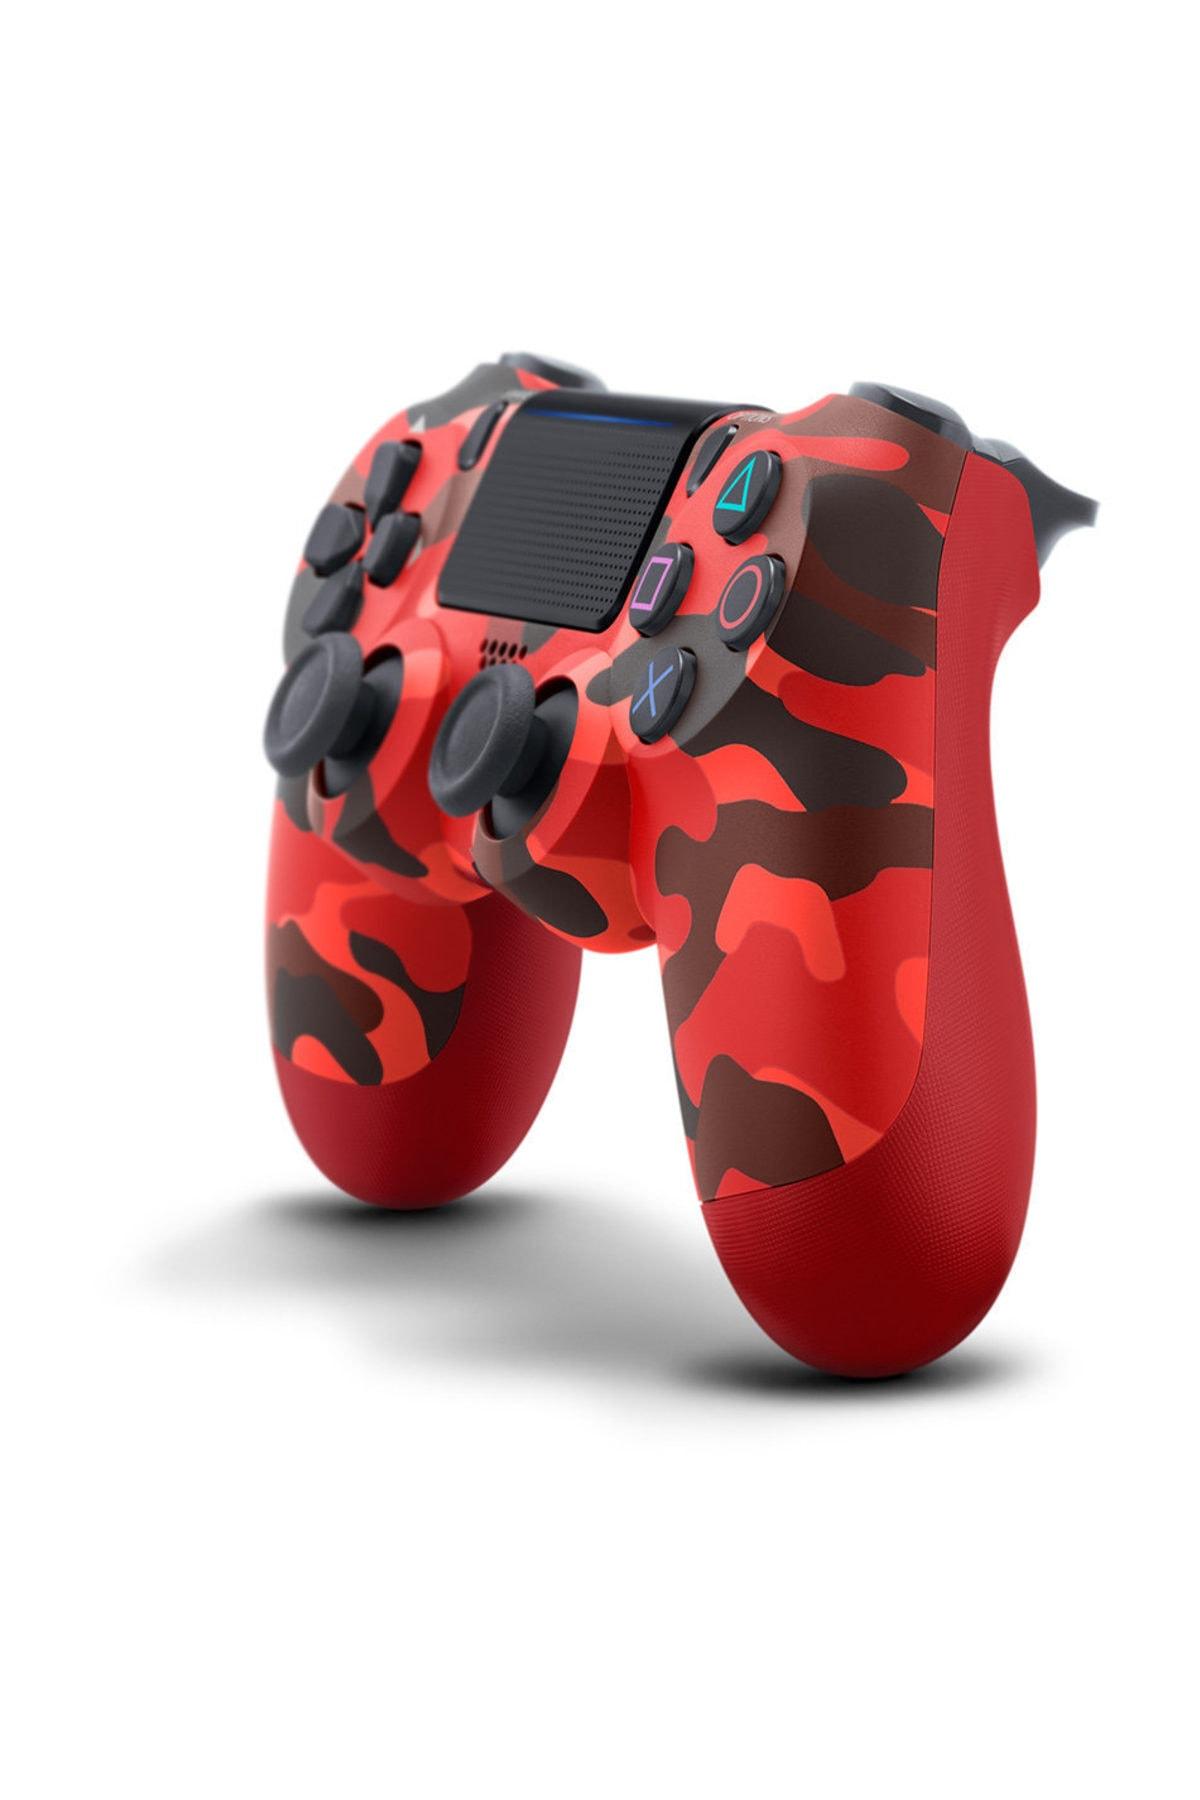 Sony PS4 Dualshock Kablosuz Kumanda Red Camouflage - Kırmızı Kamuflaj V2